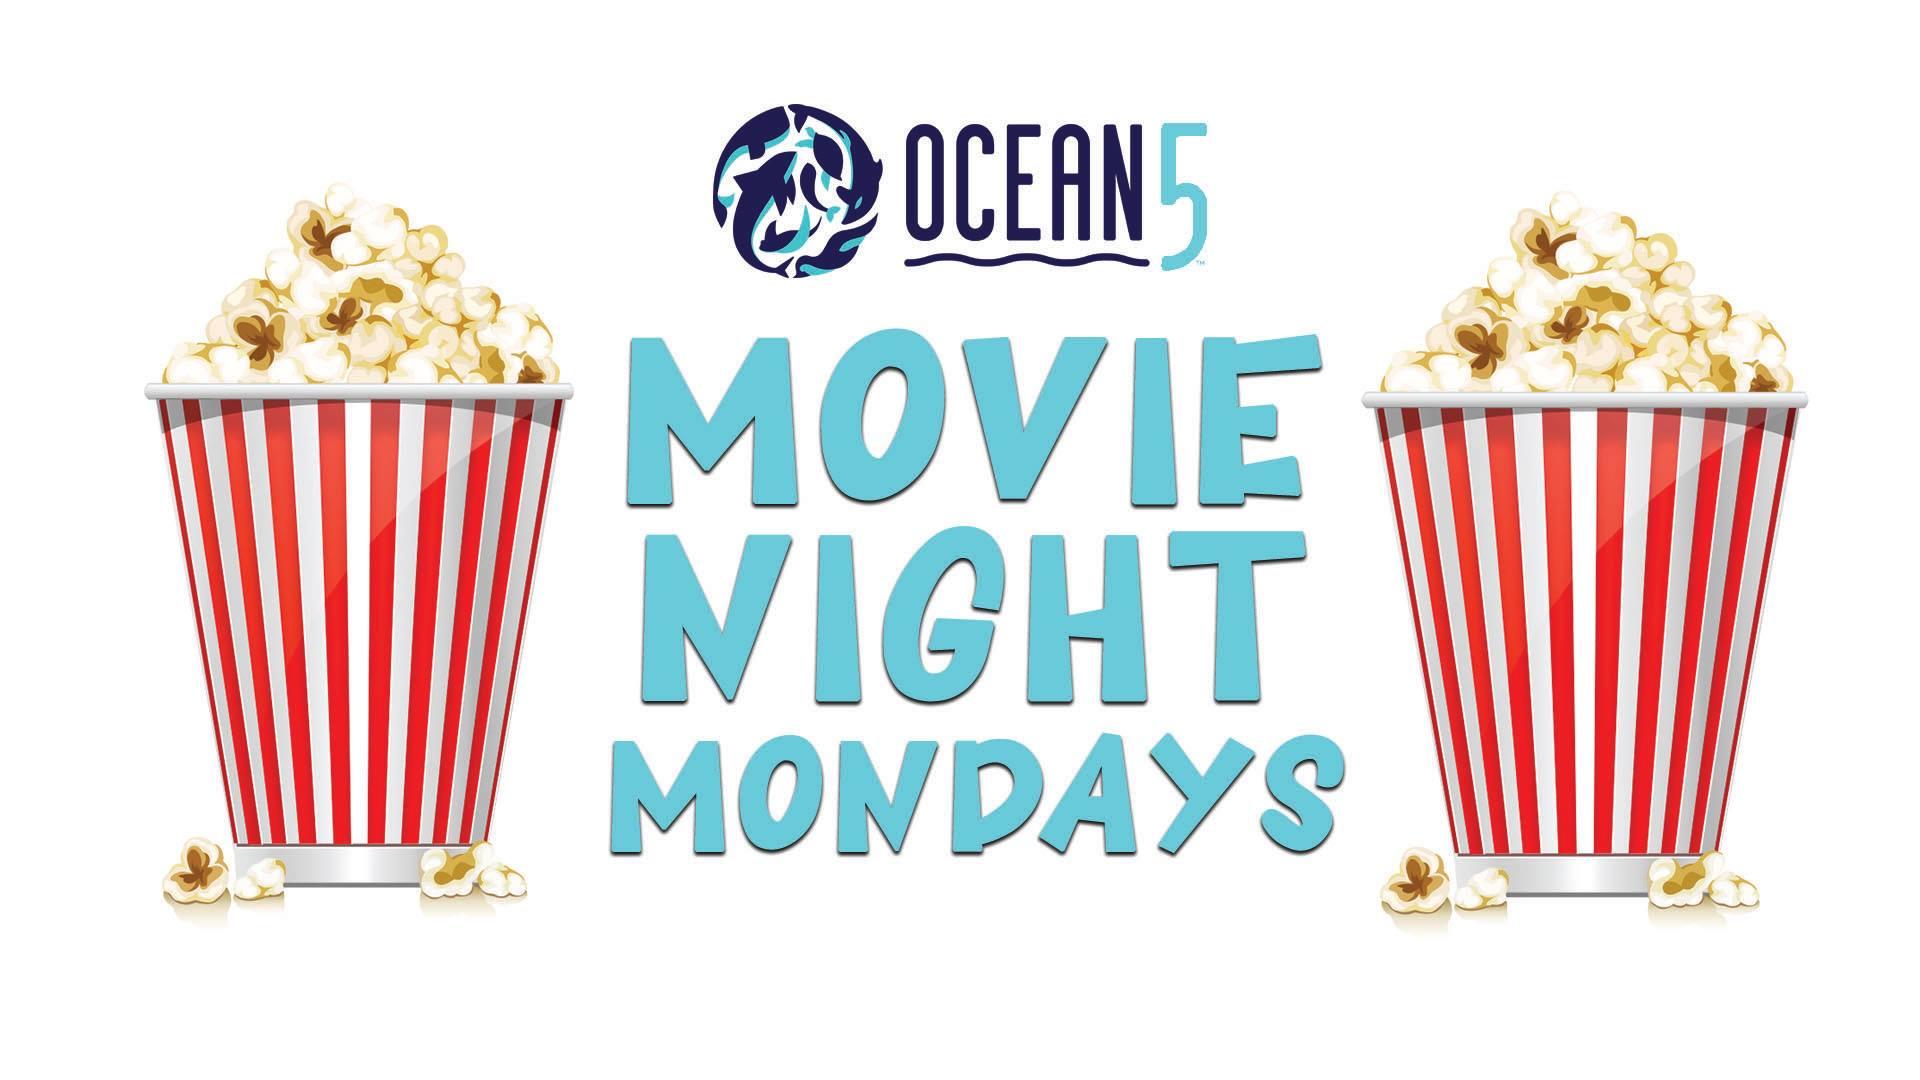 Gig Harbor ,Events, Move Night, Ocean5, vene, bowling, Lazer Tag, Movie, Mondays, Popcorn, food